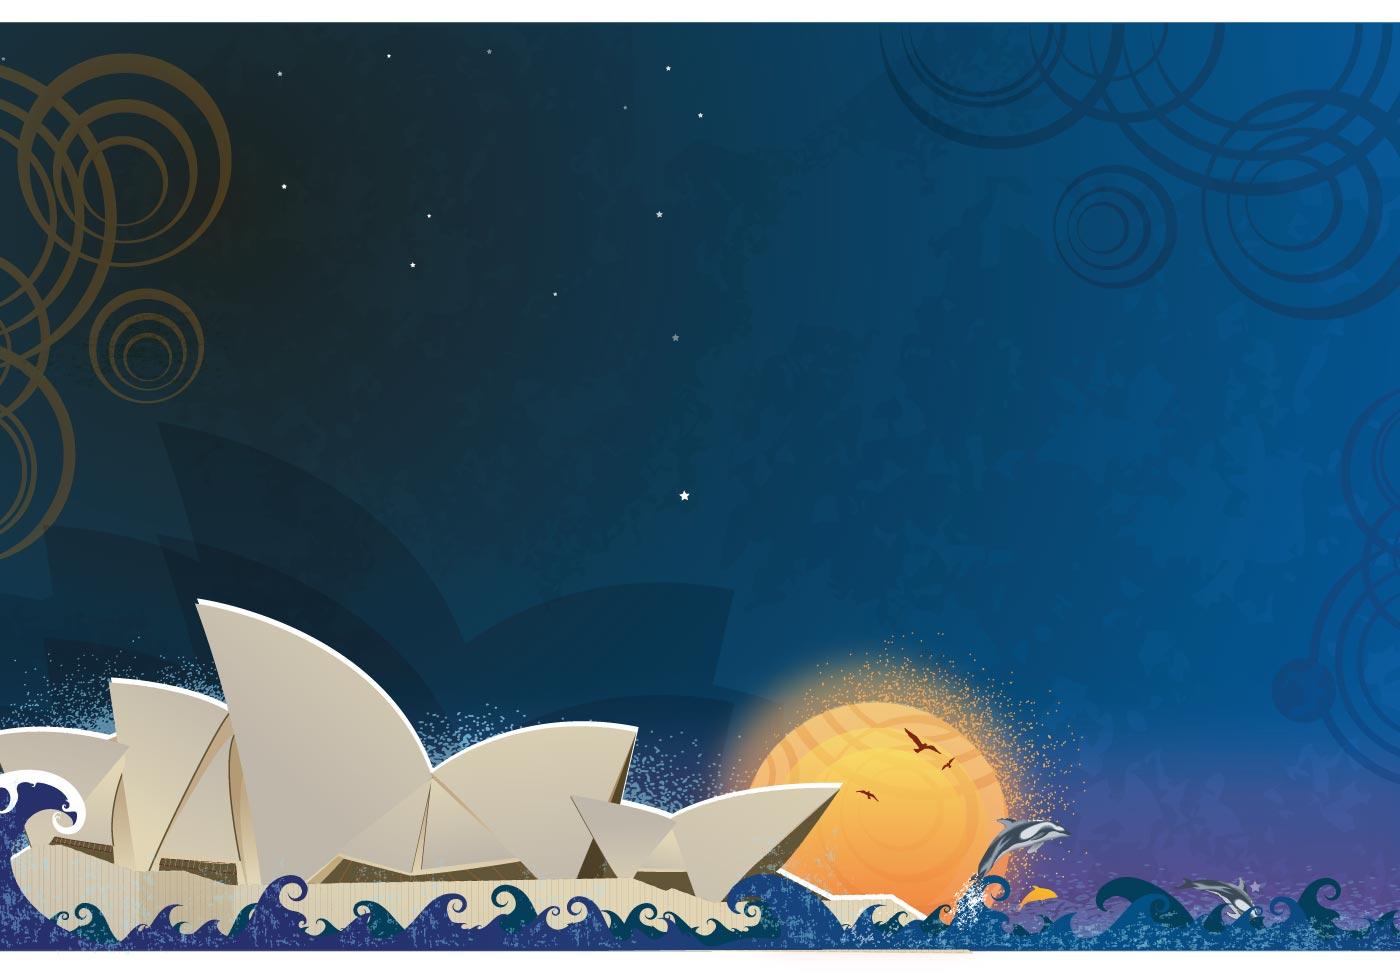 Cute Nautical Wallpaper Sydney Opera House Theatre Download Free Vector Art